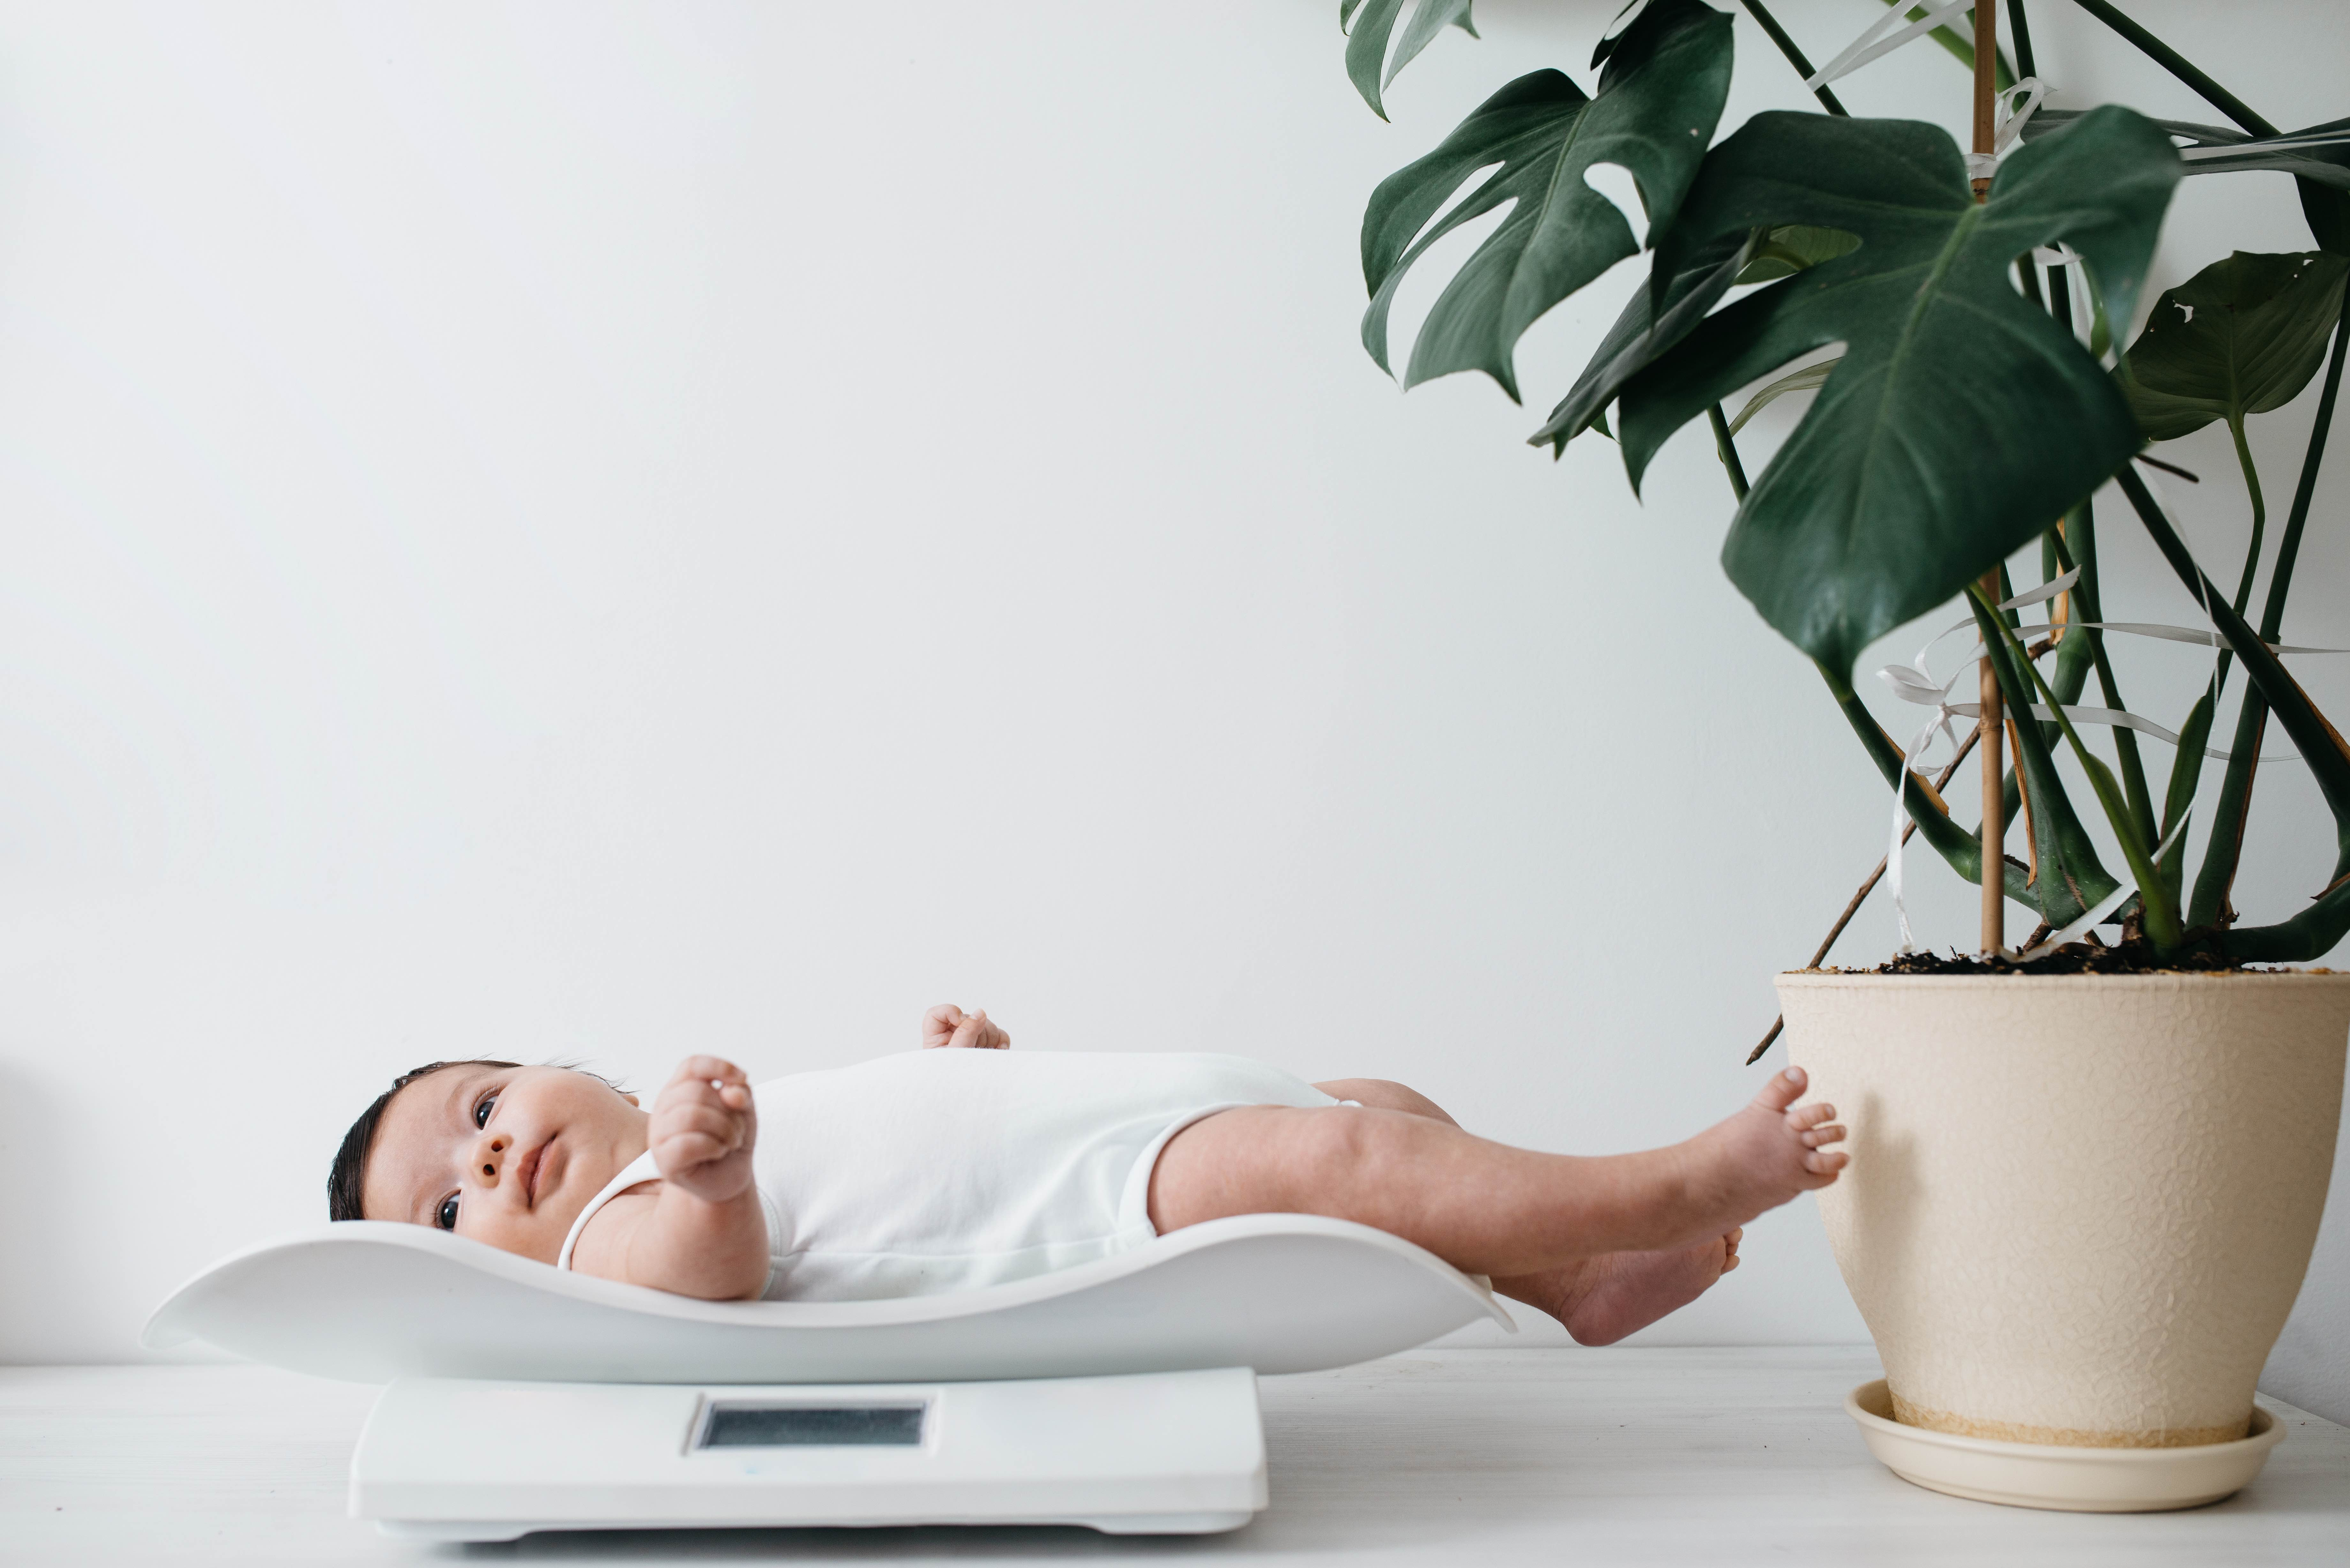 Simak, 7 Faktor yang Memengaruhi Berat Badan Bayi